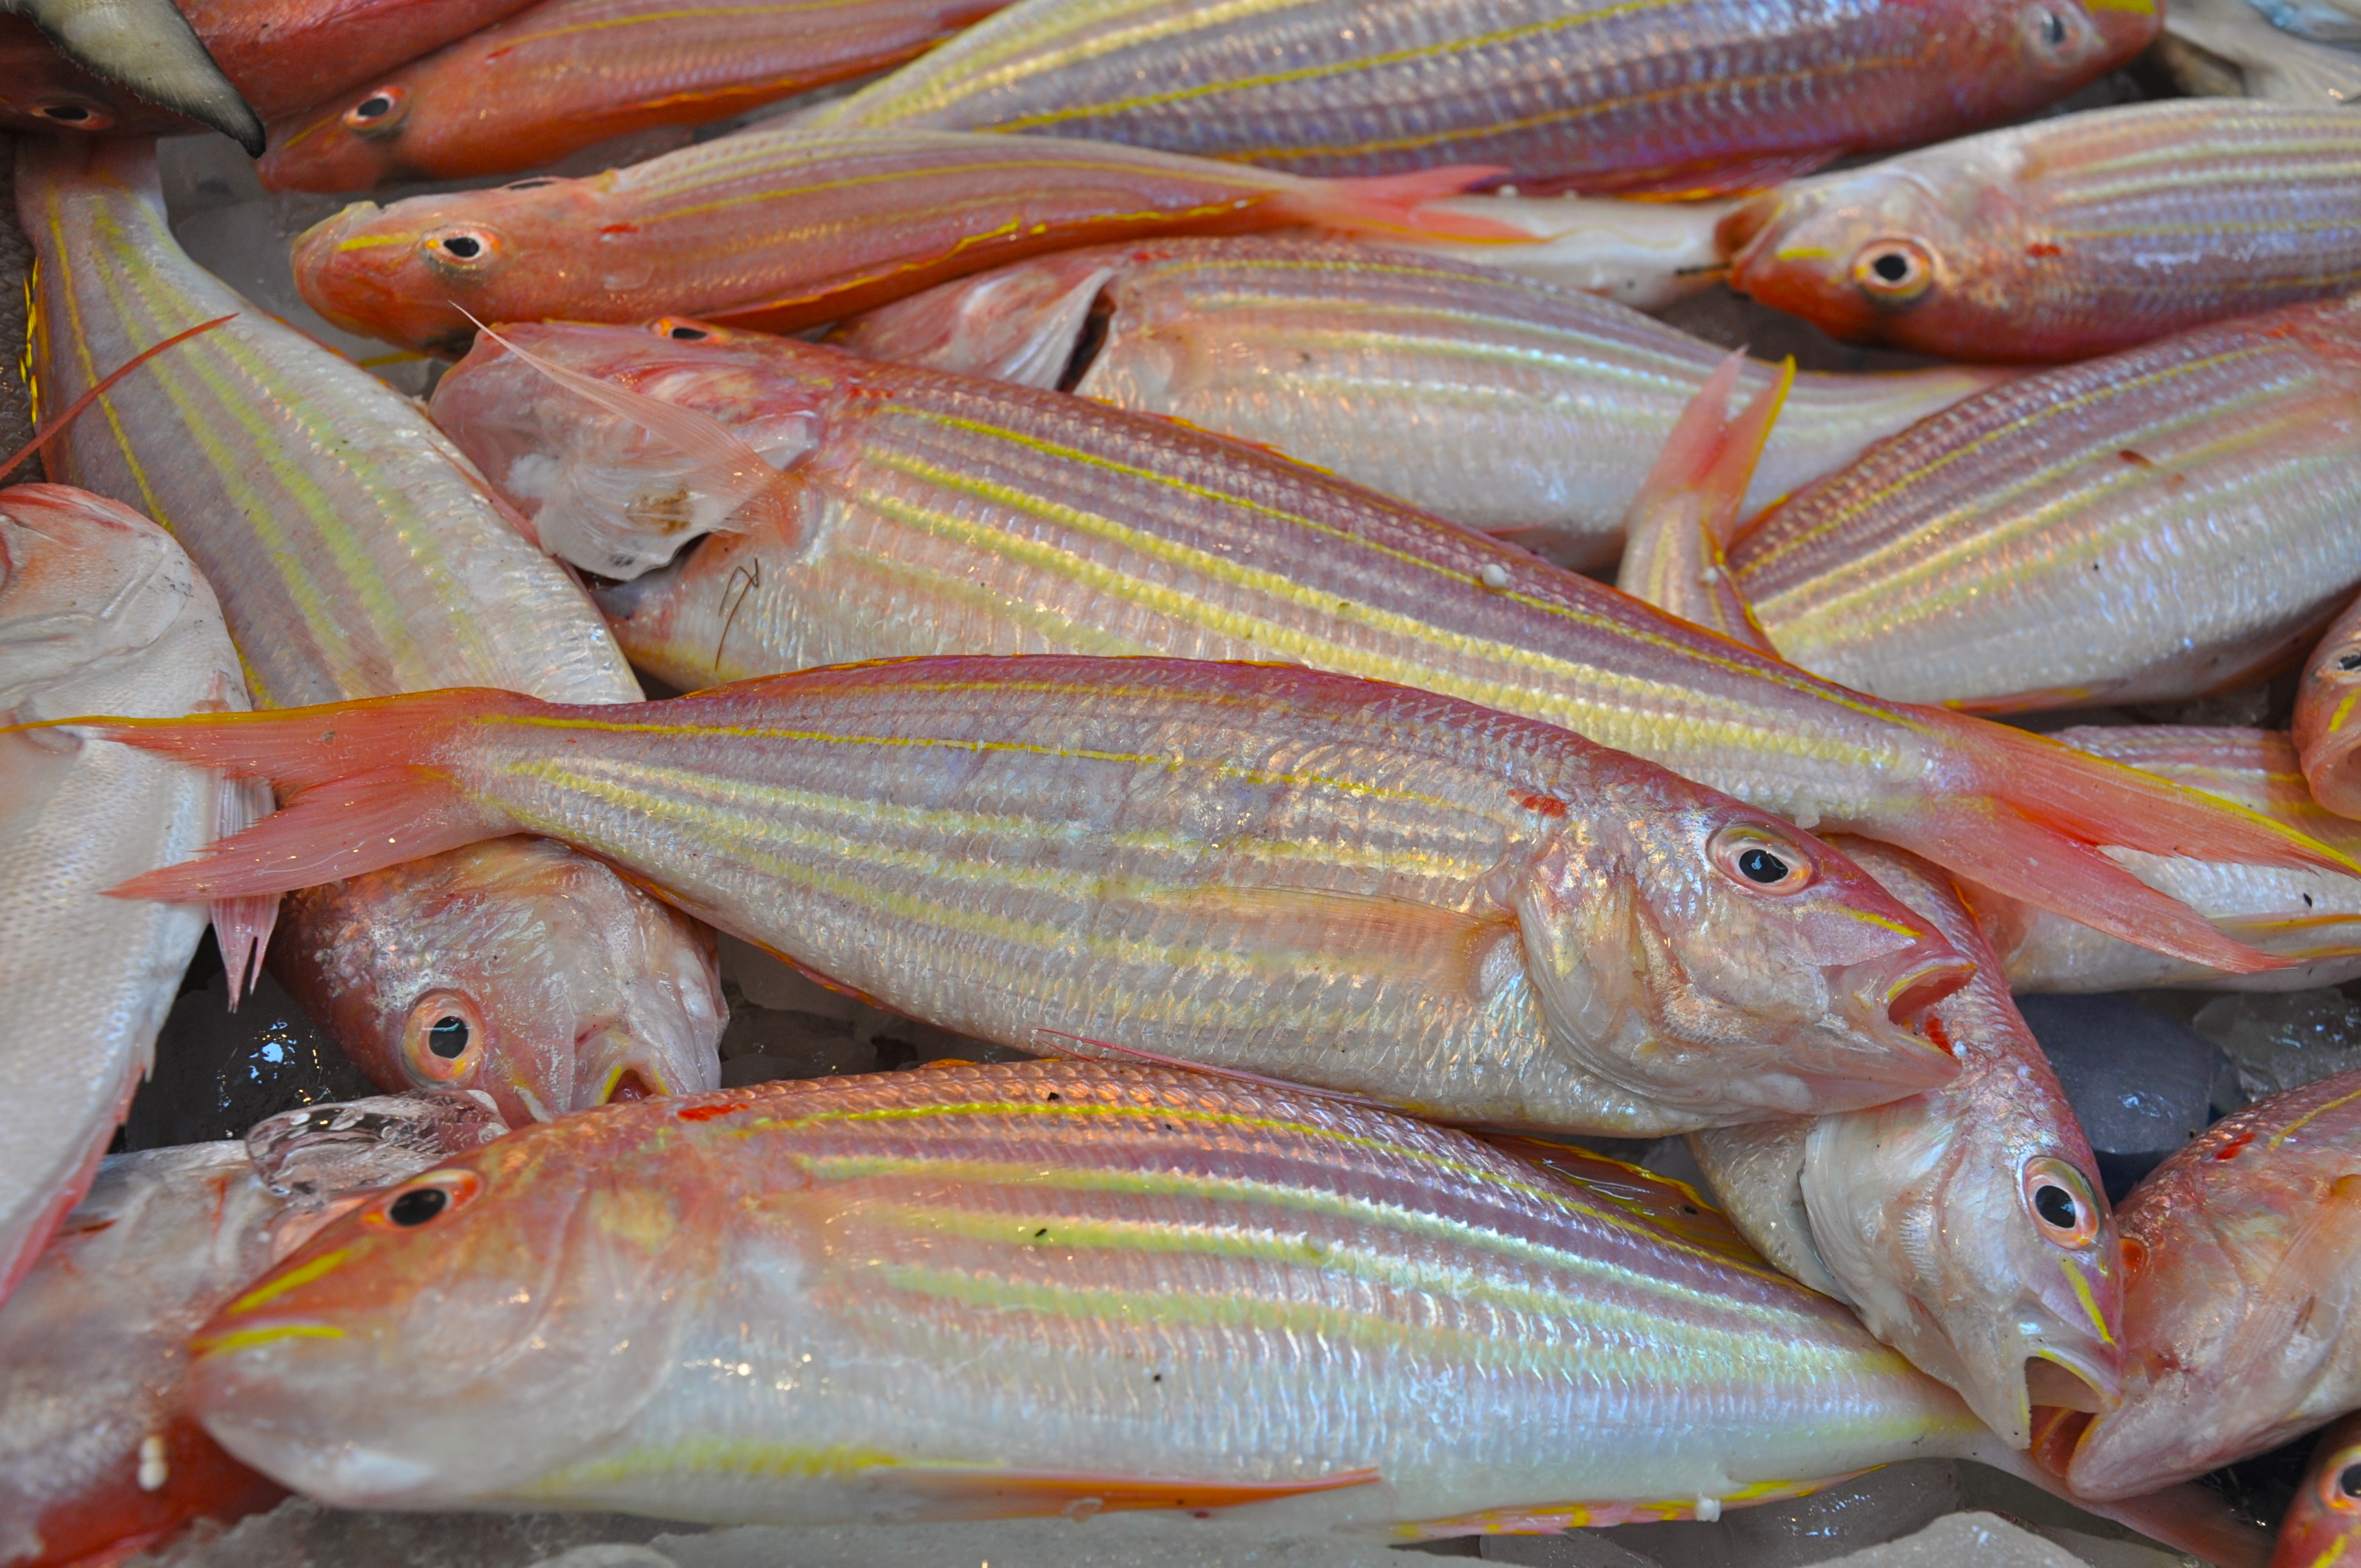 Hong kong notebook angela neal grove for Fresh fish market miami